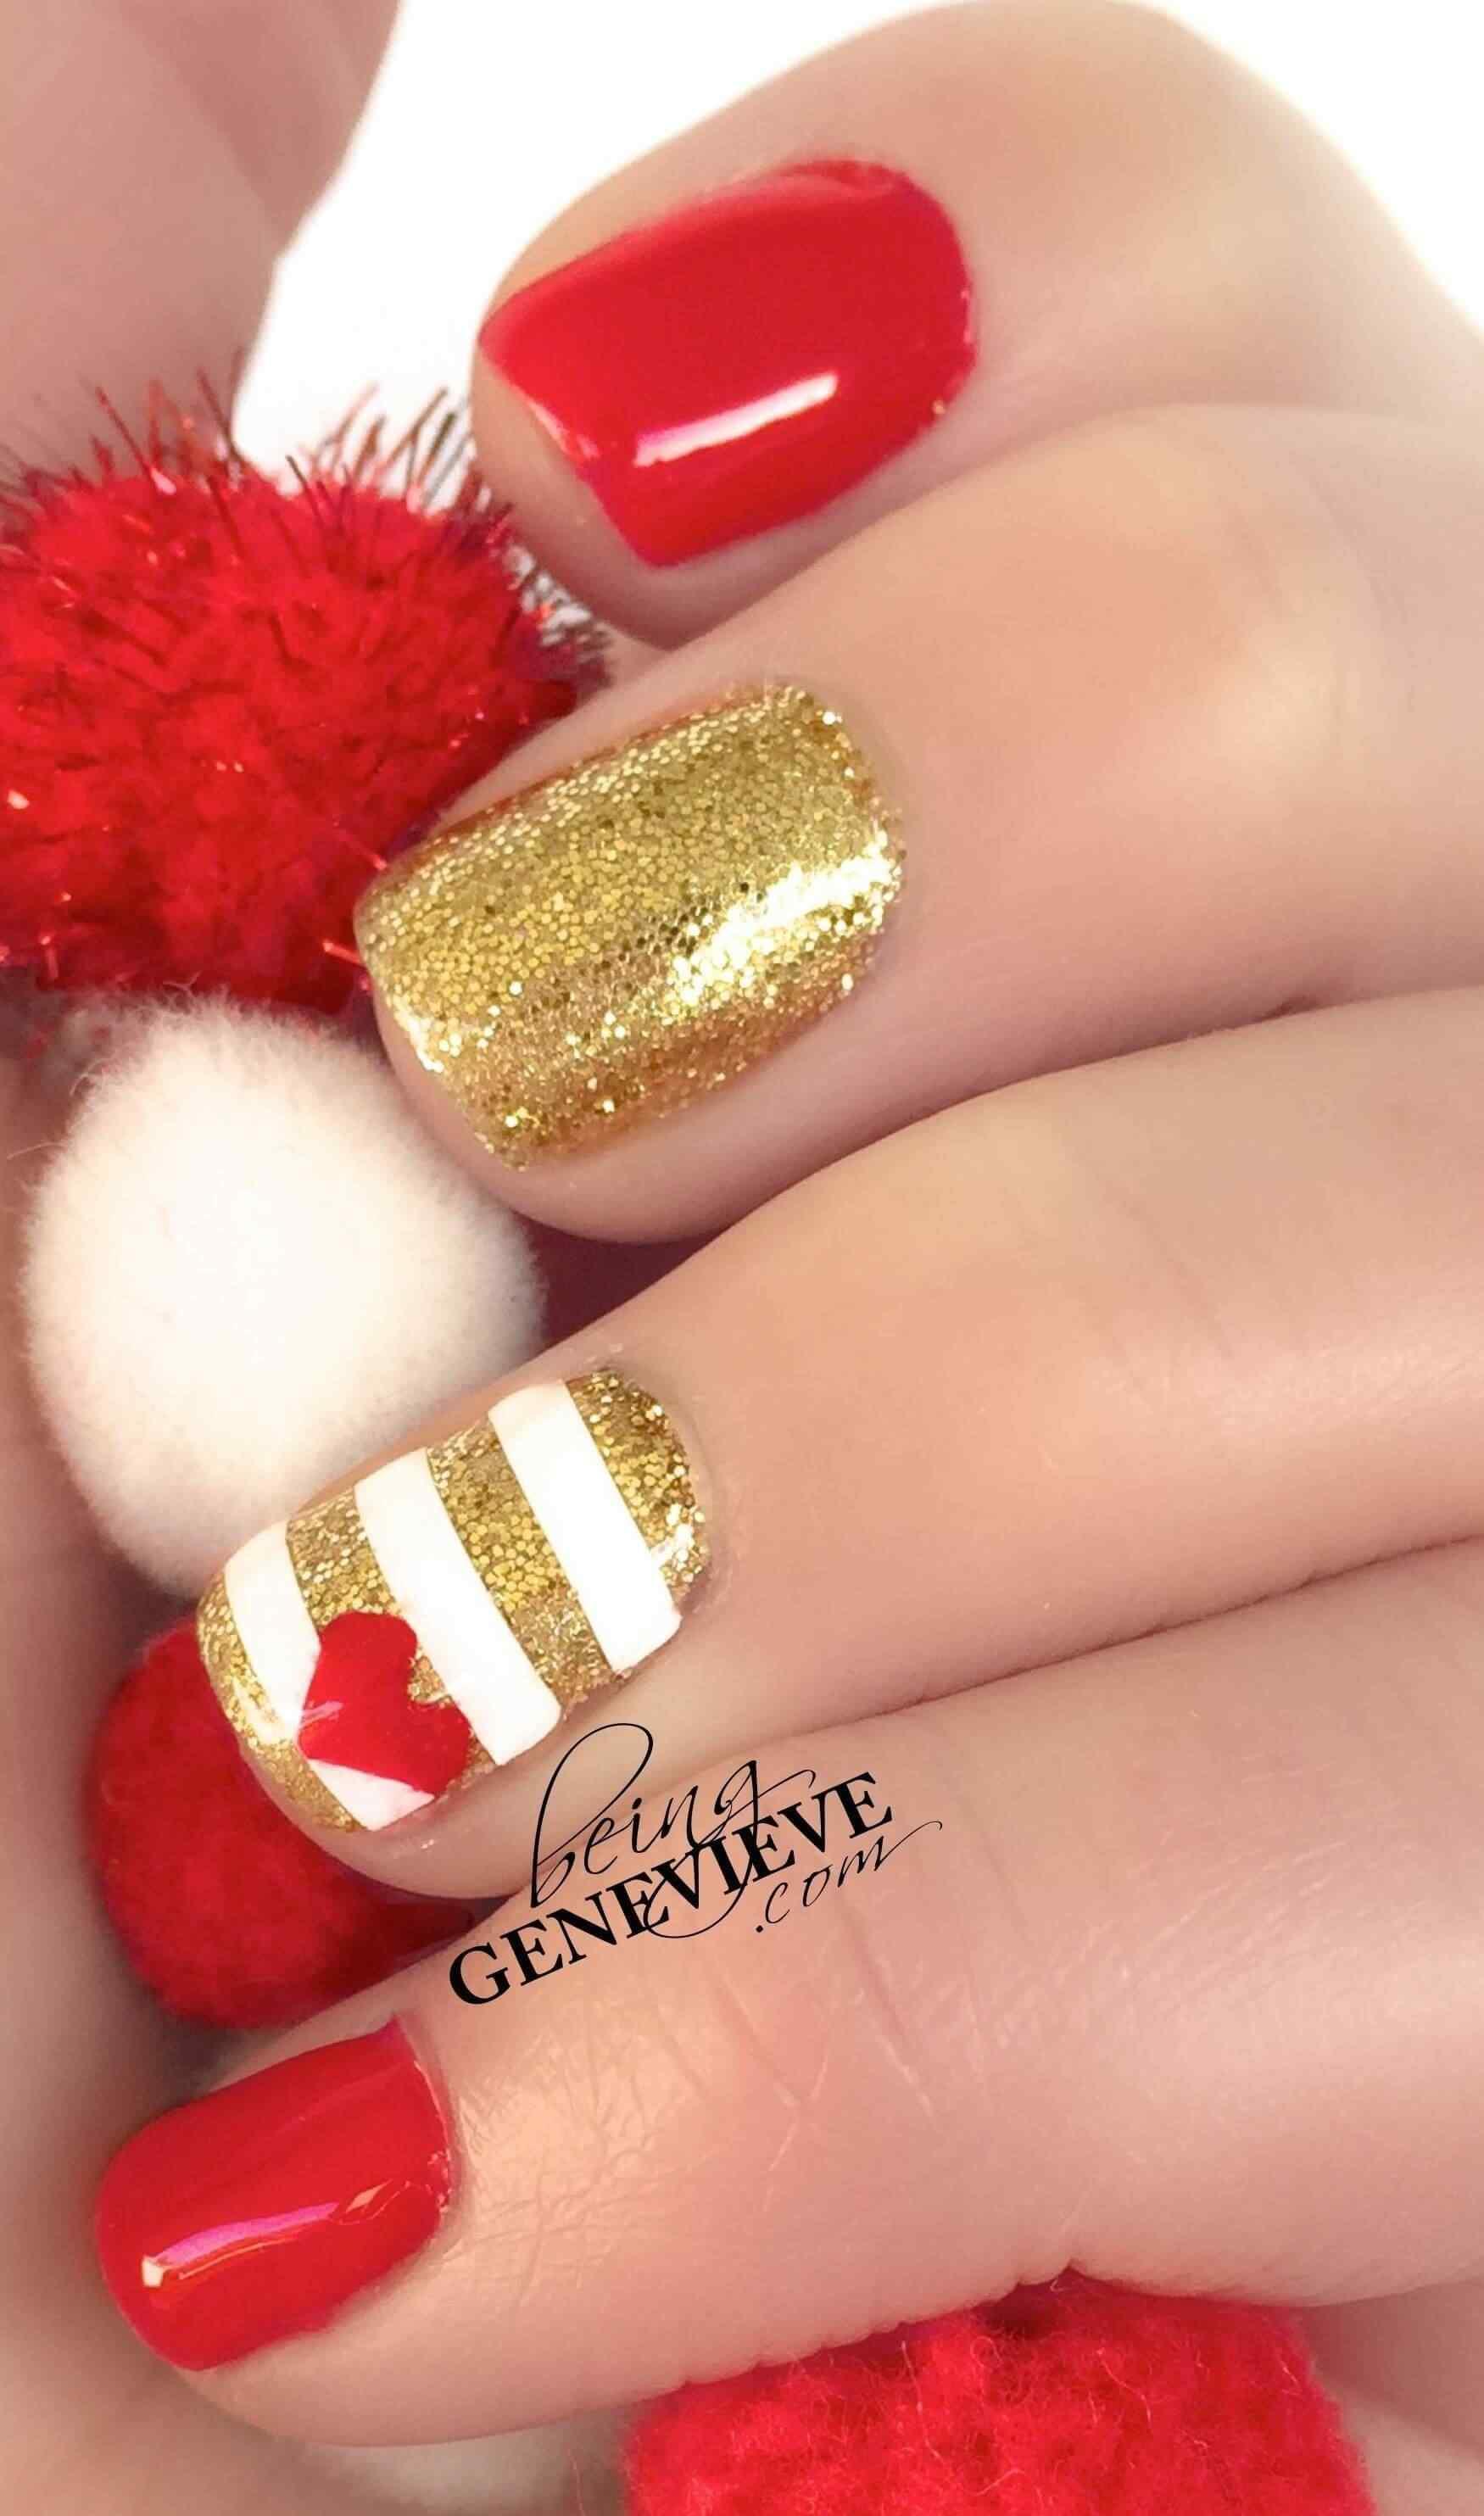 Rojo carmesí con dorado en las uñas